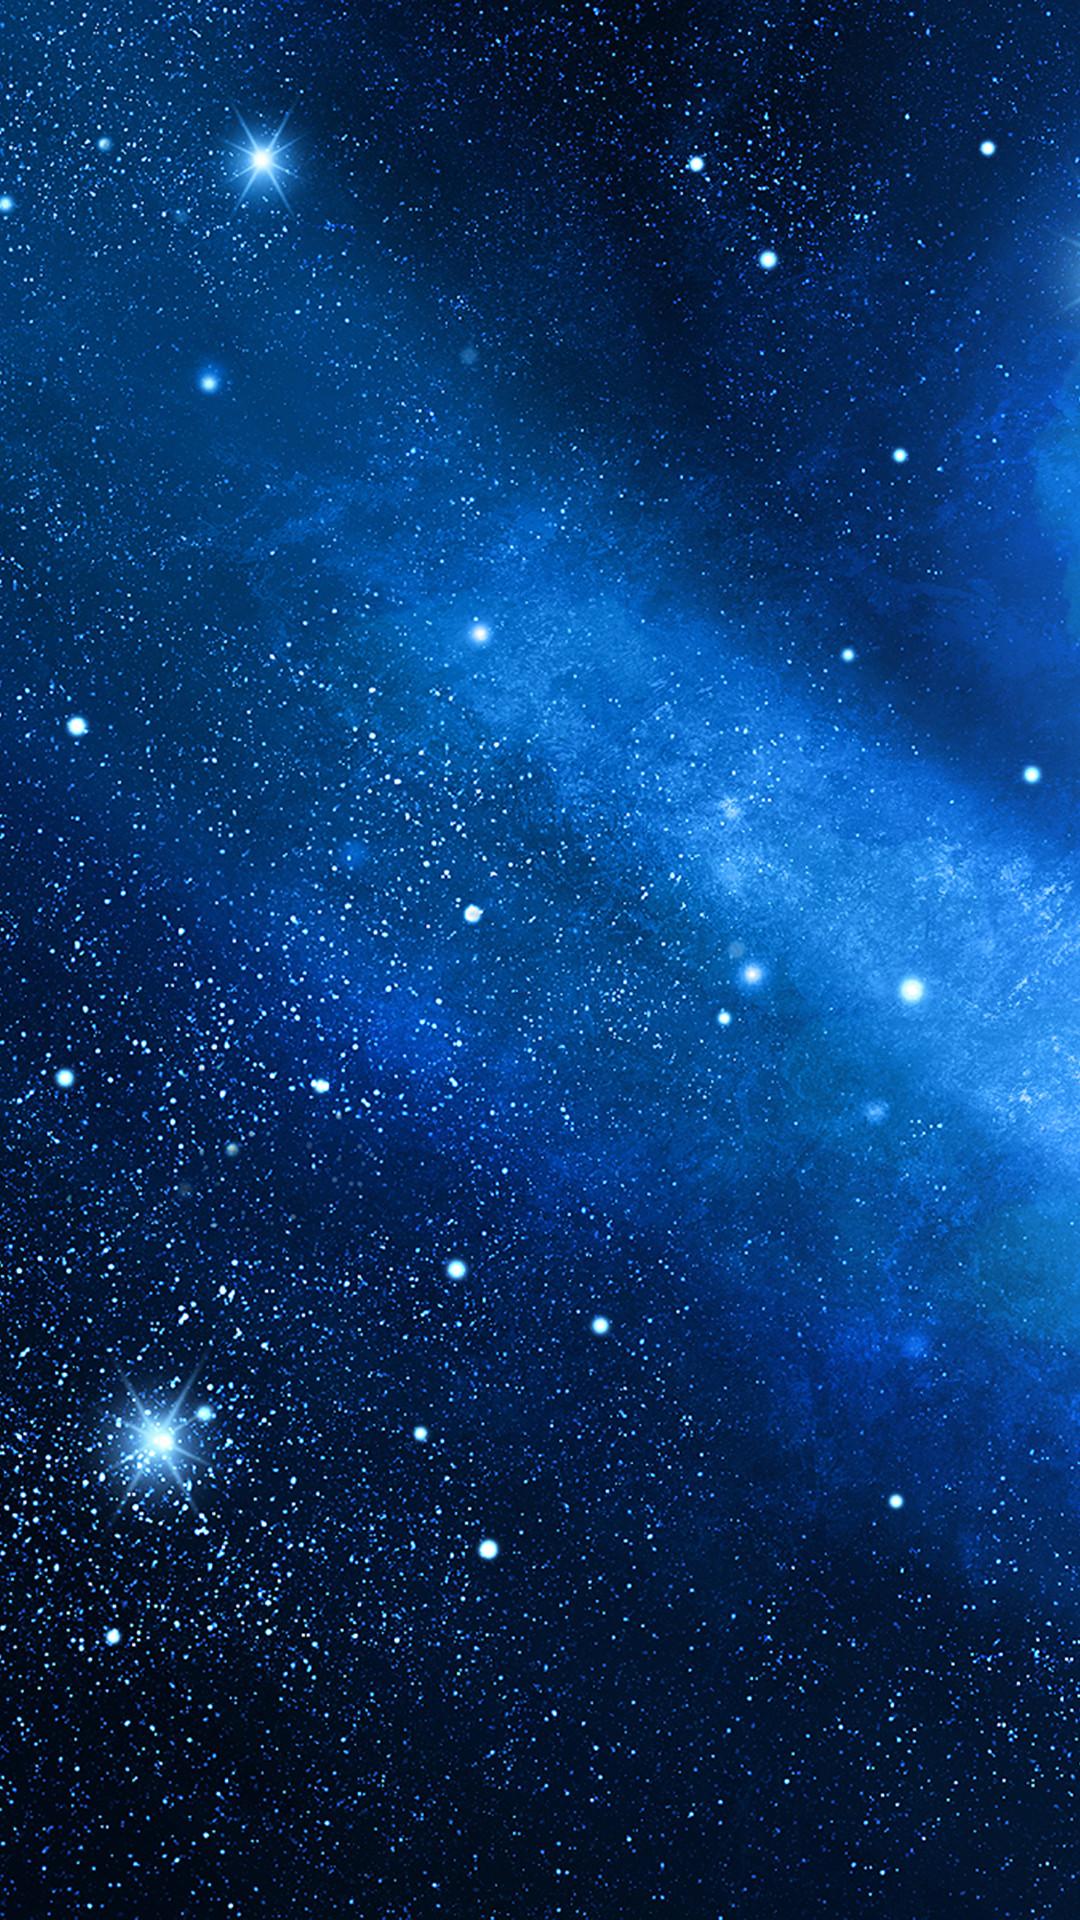 Explore Galaxy Wallpaper, Iphone 6 Wallpaper, and more!